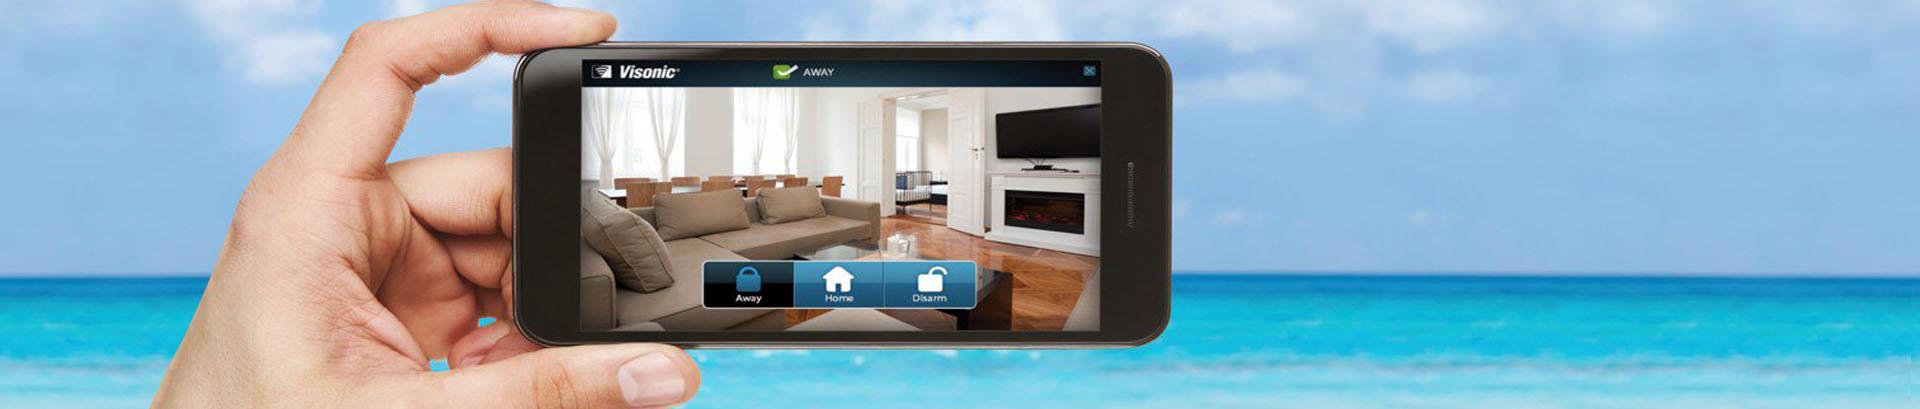 Frinton Alarm Systems - CCTV App